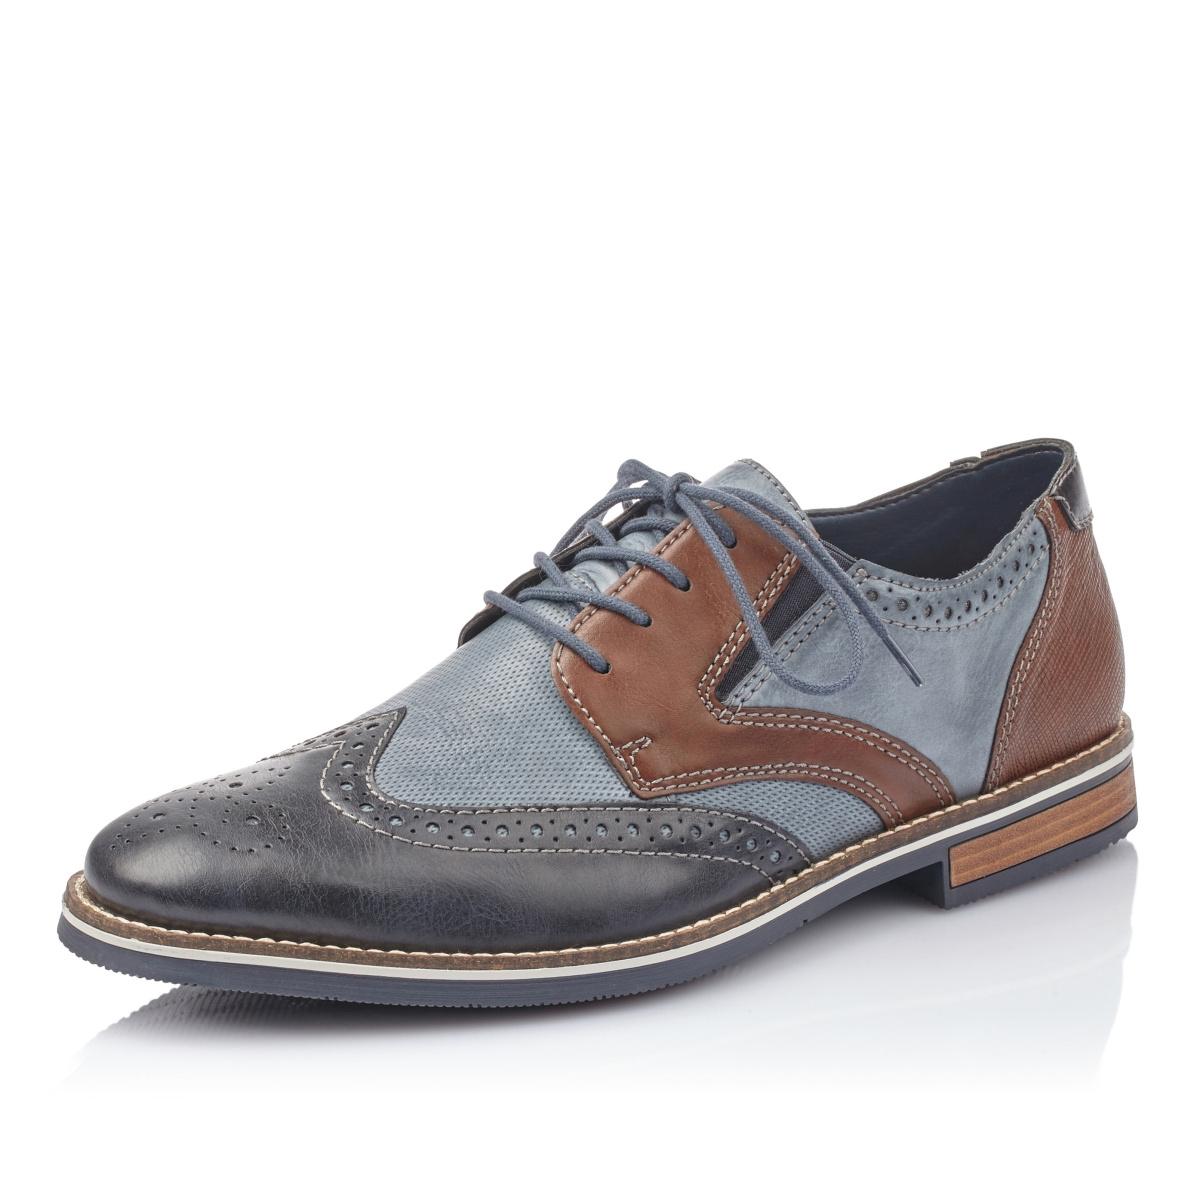 338b1a2412 detail Pánská obuv RIEKER 13520-16 BLAU KOMBI F S 9